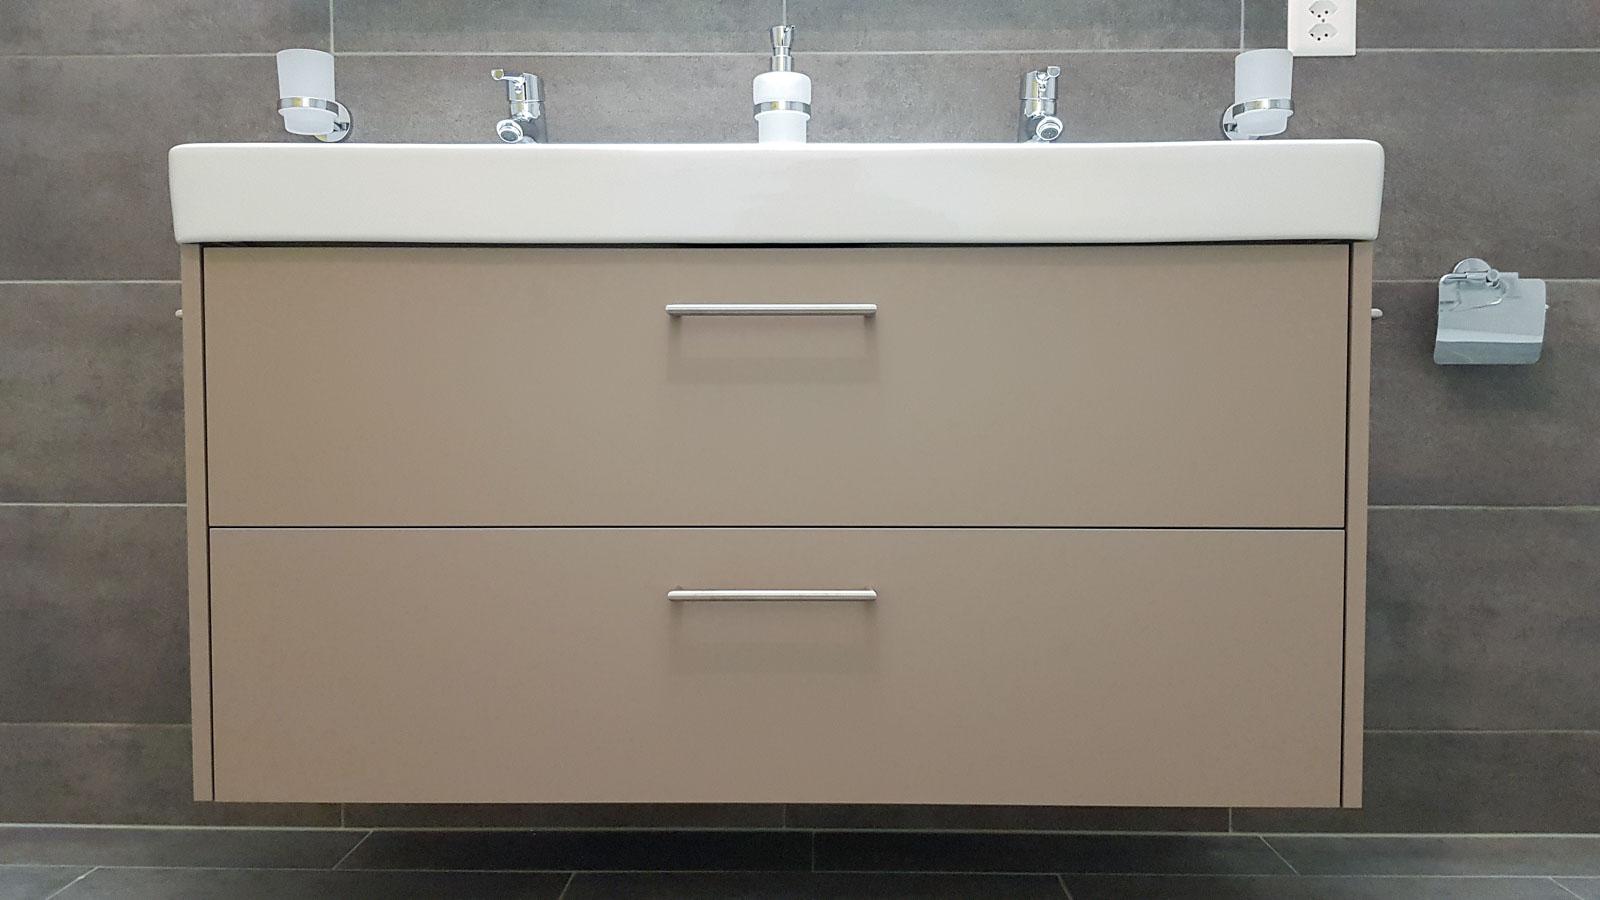 Wooddesign_Badmöbel_Neubau_Syphonausschnitt_Unterbaumöbel_Erdfarbe (2)